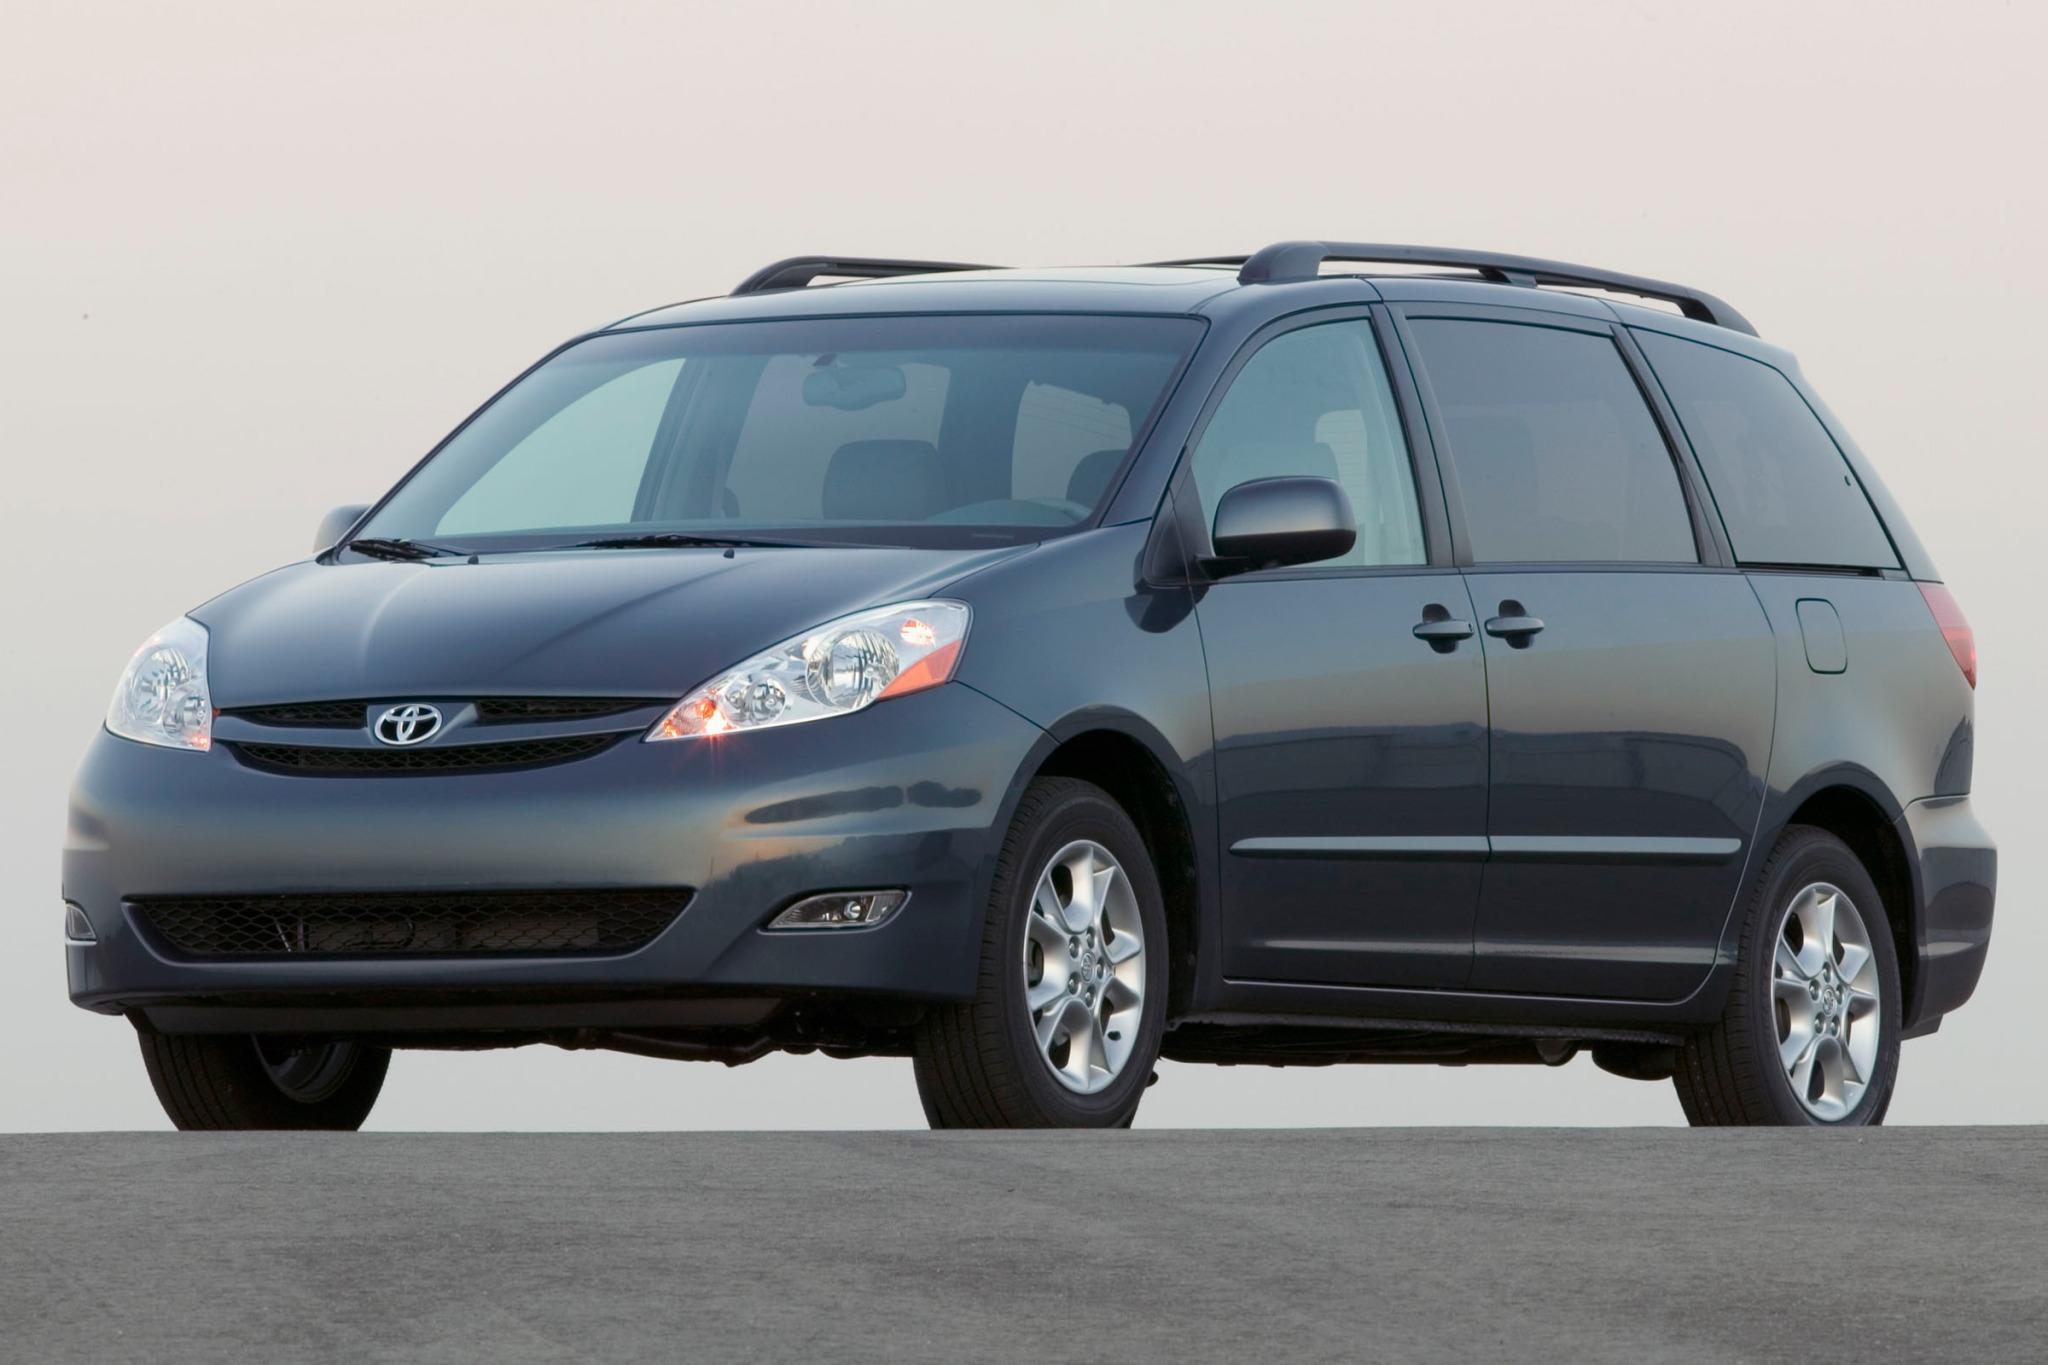 2007 Toyota Sienna Image 2